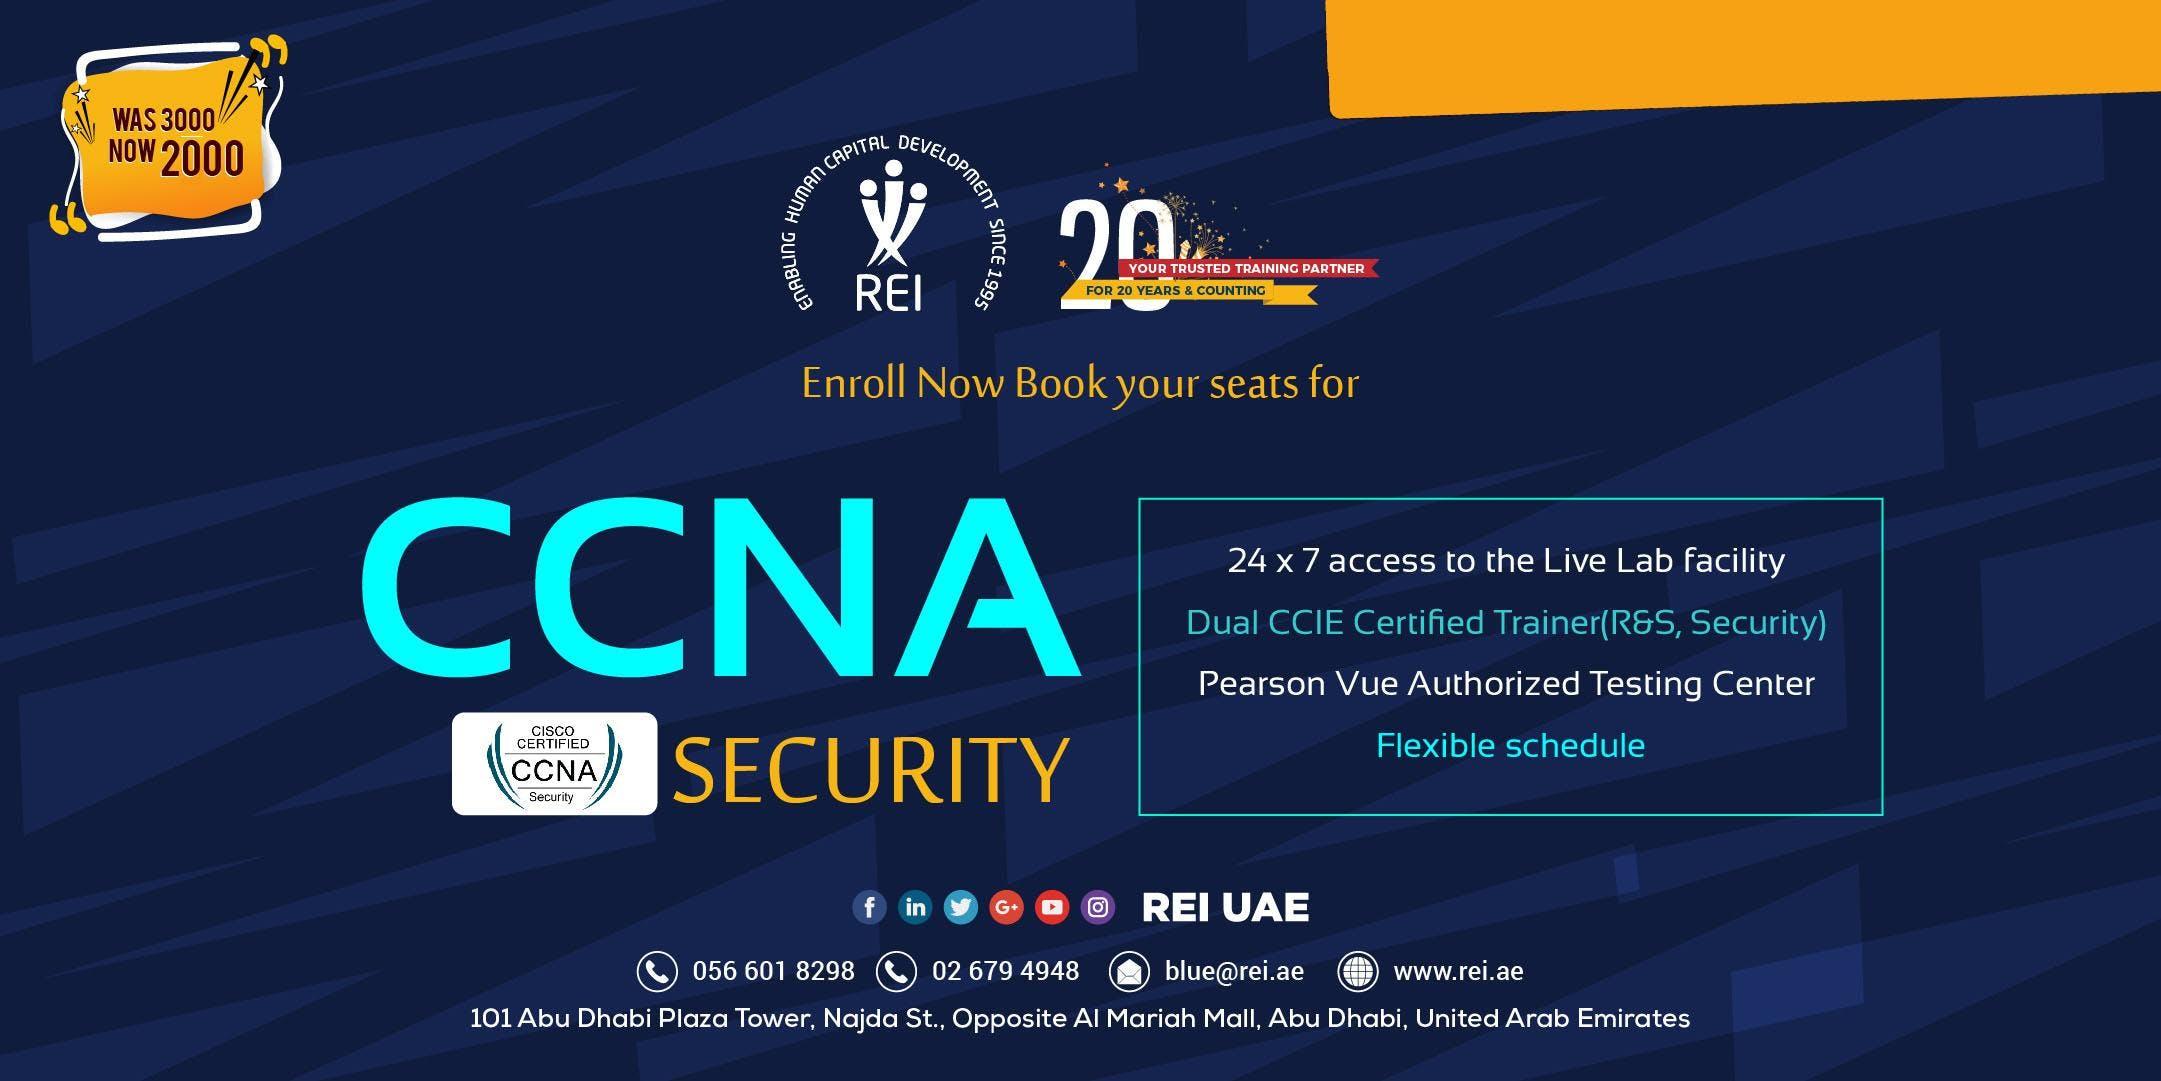 Ccna Security Certification Training In Rei Abu Dhabi 21 Nov 2018